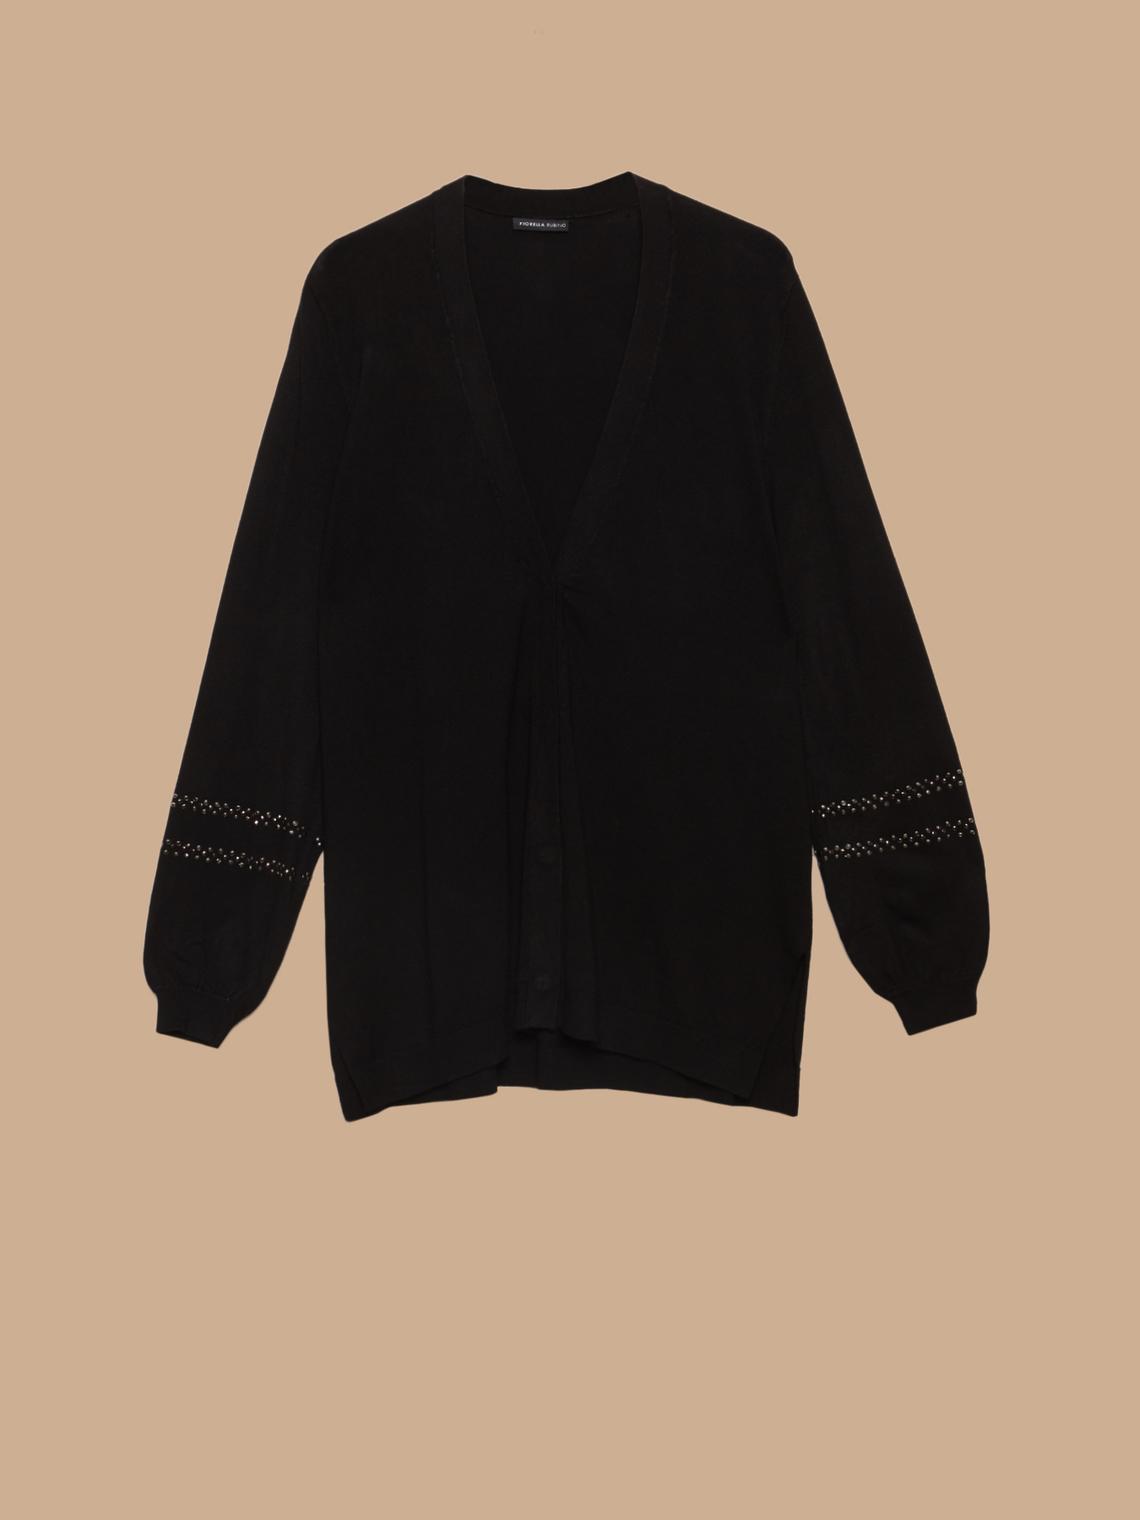 huge discount 0fc7d fdba7 Cardigan lungo con borchie - FiorellaRubino.com